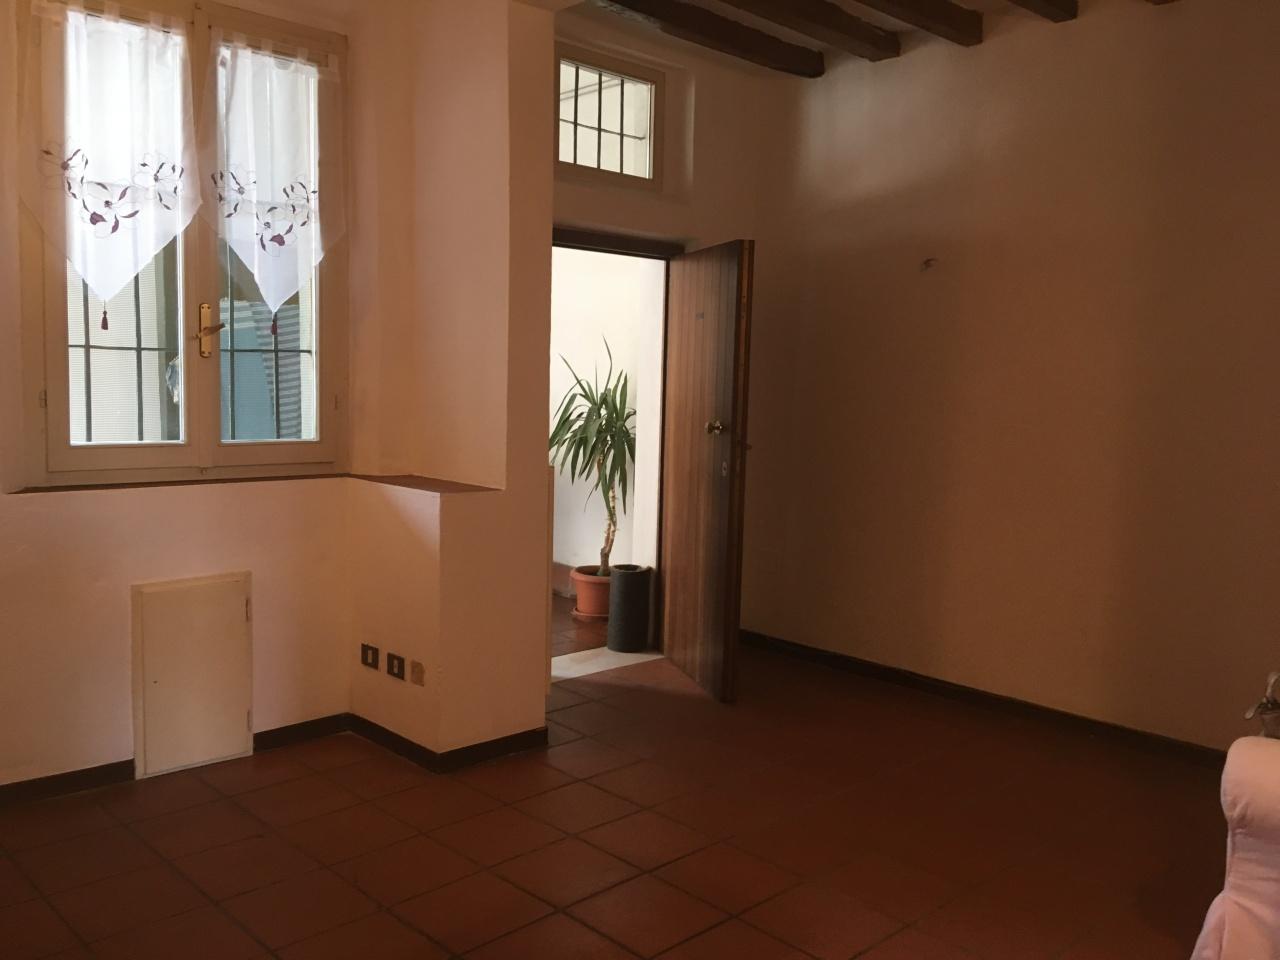 Appartamento - 2 camere a Parma